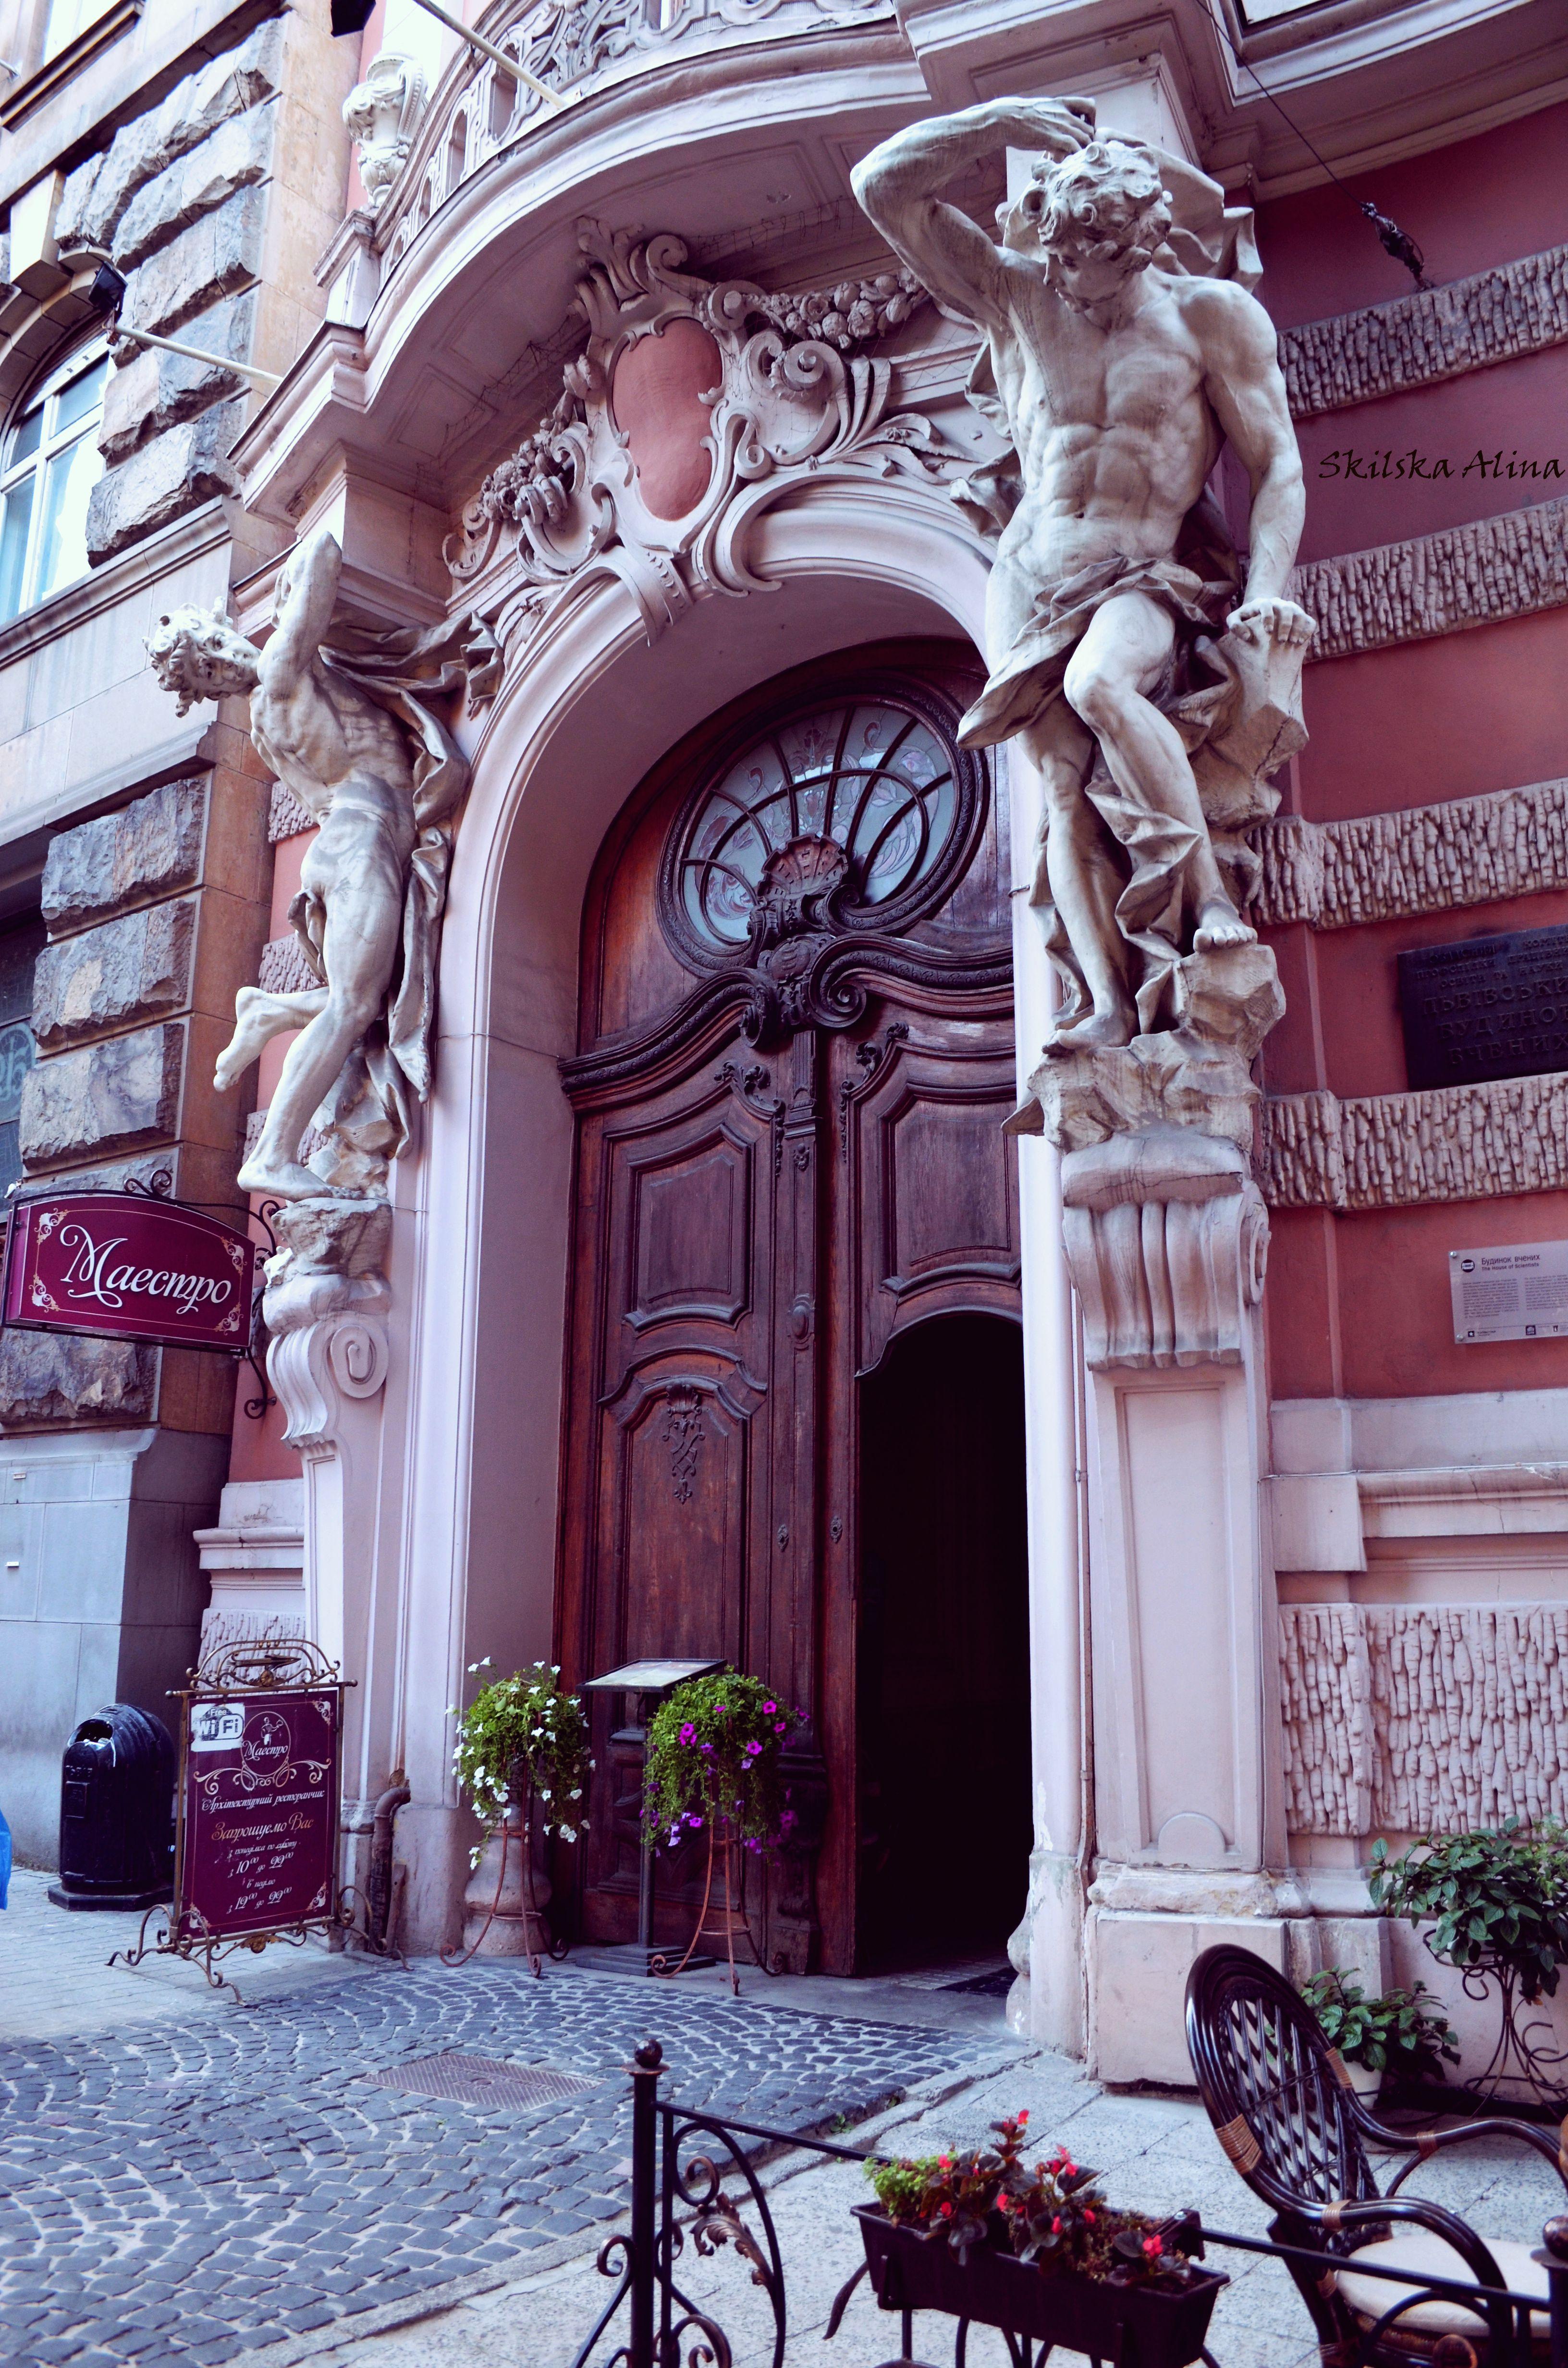 Pin By Nataliia On My Photos Lviv Ukraine Photo